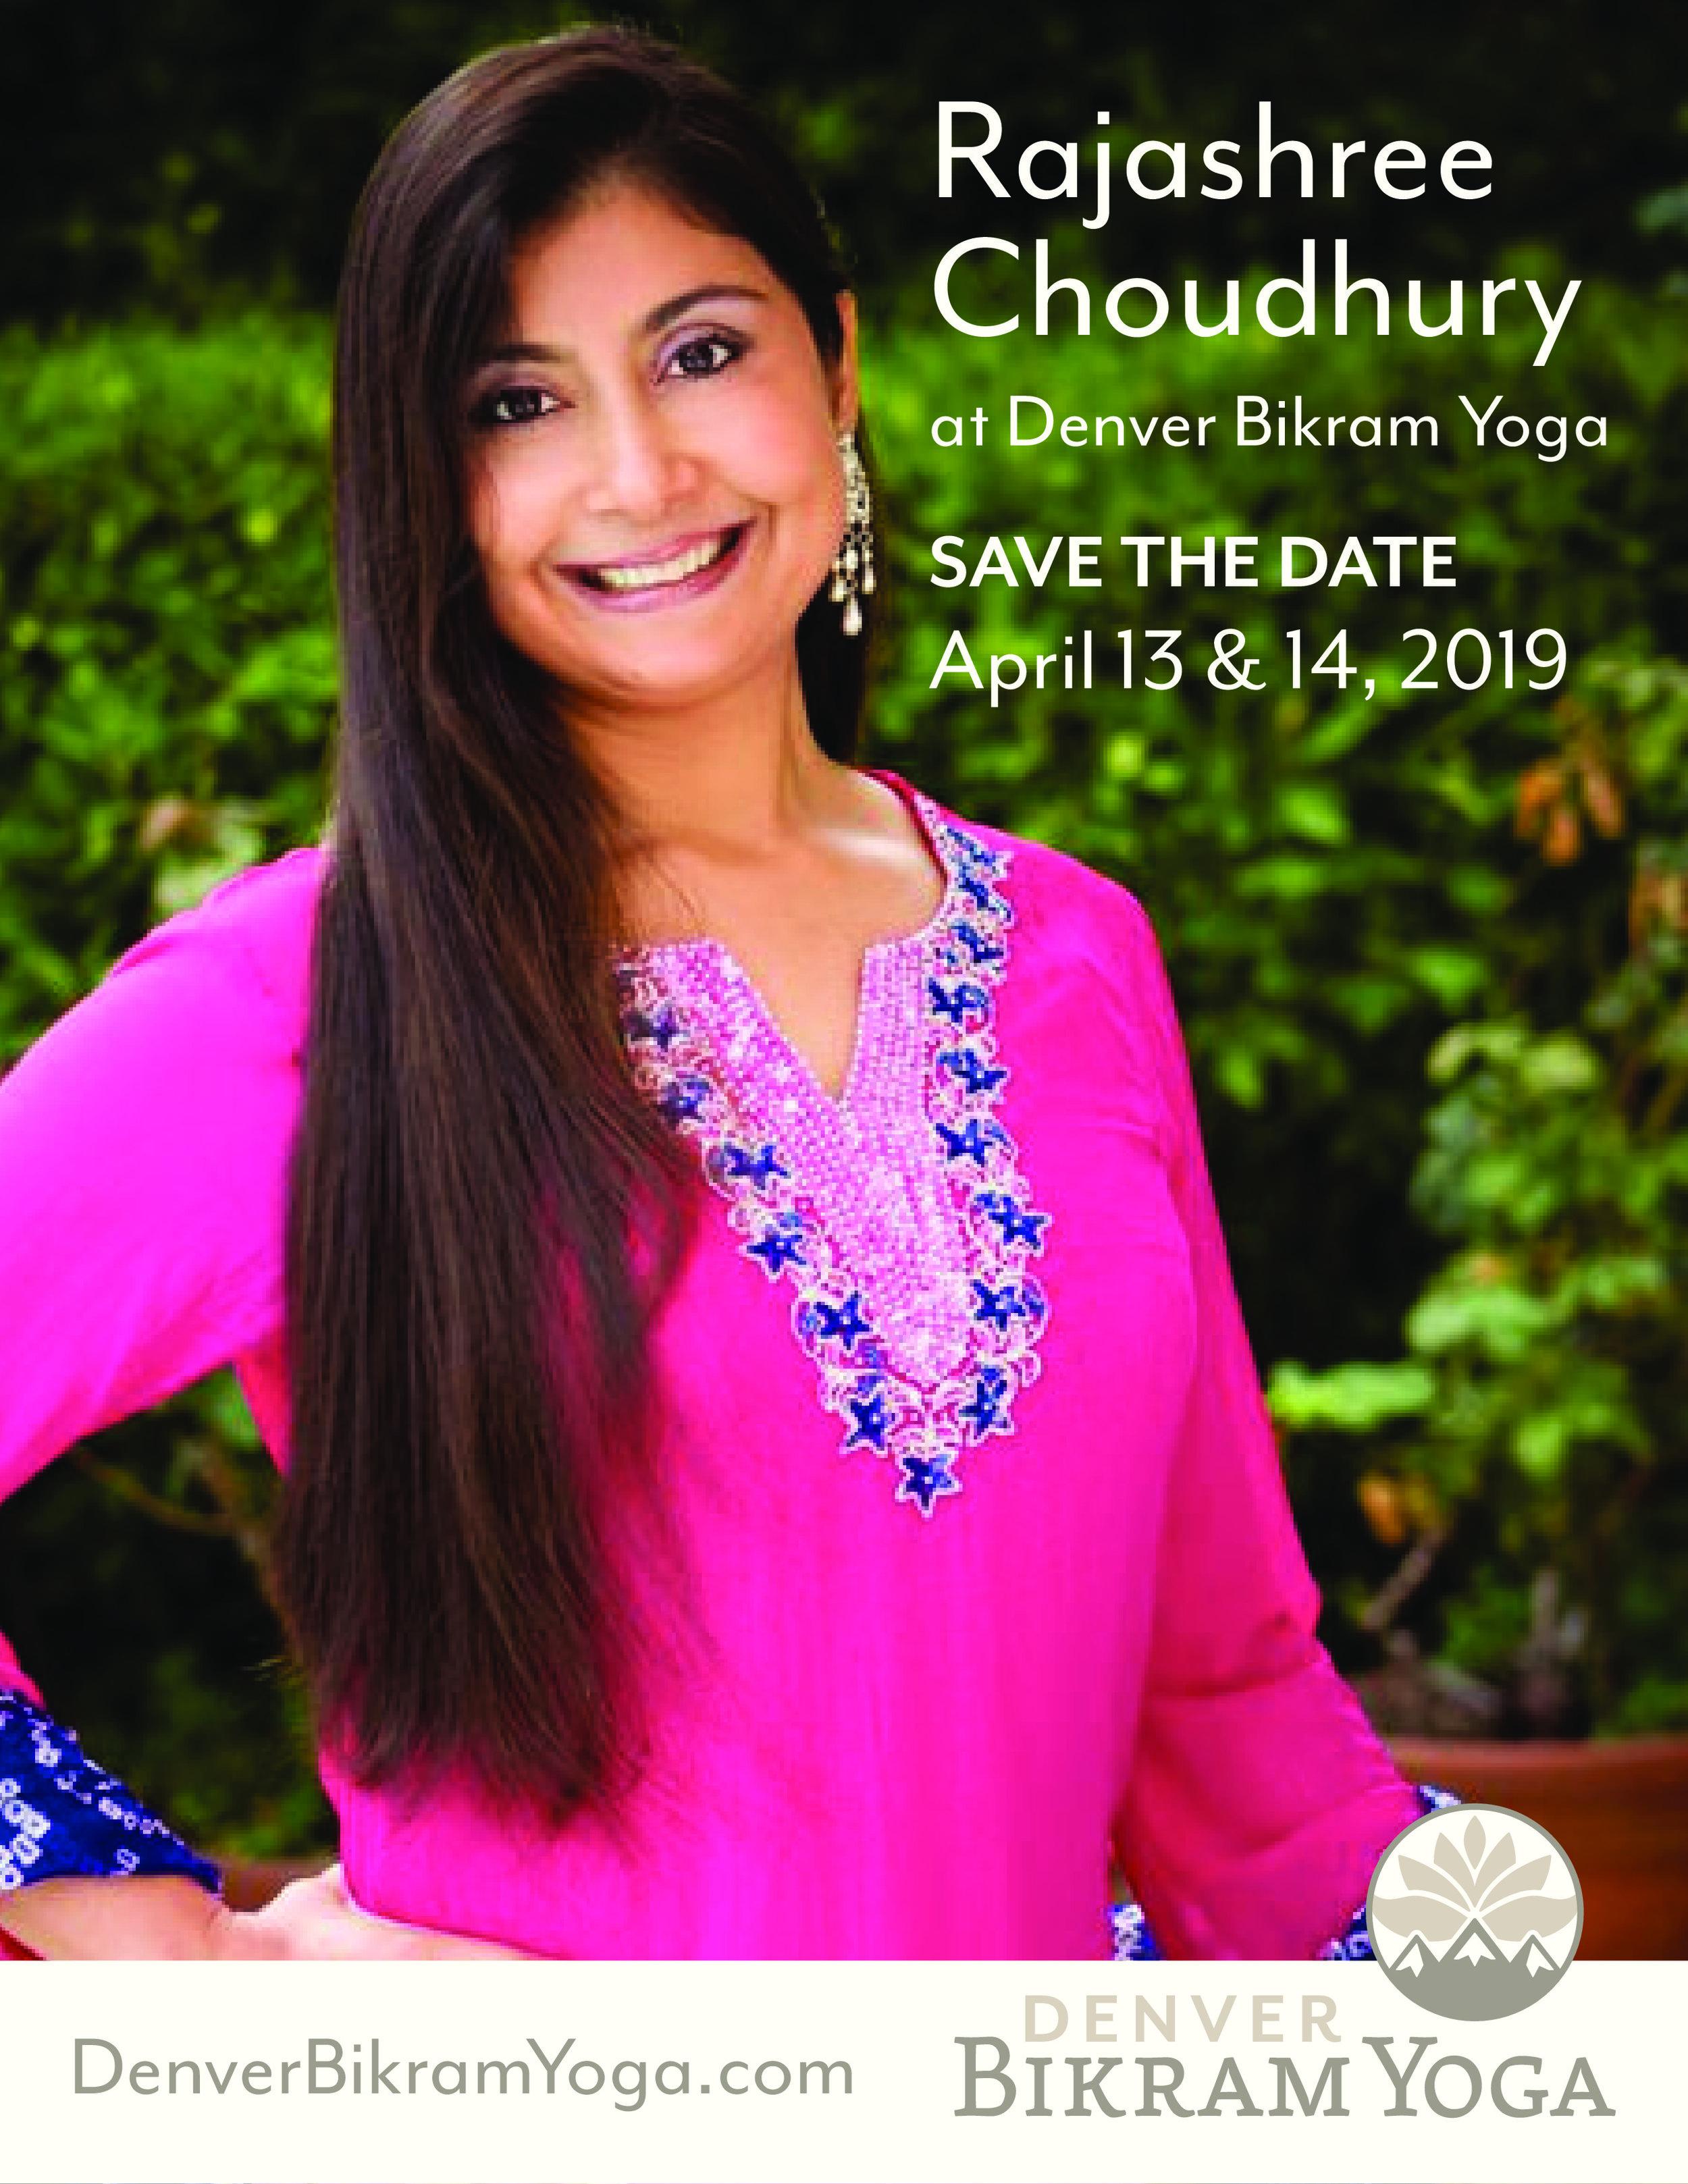 Events Rajashree Choudhury Rajashree Choudhury Pregnancy Yoga Bikram Yoga Teacher Training